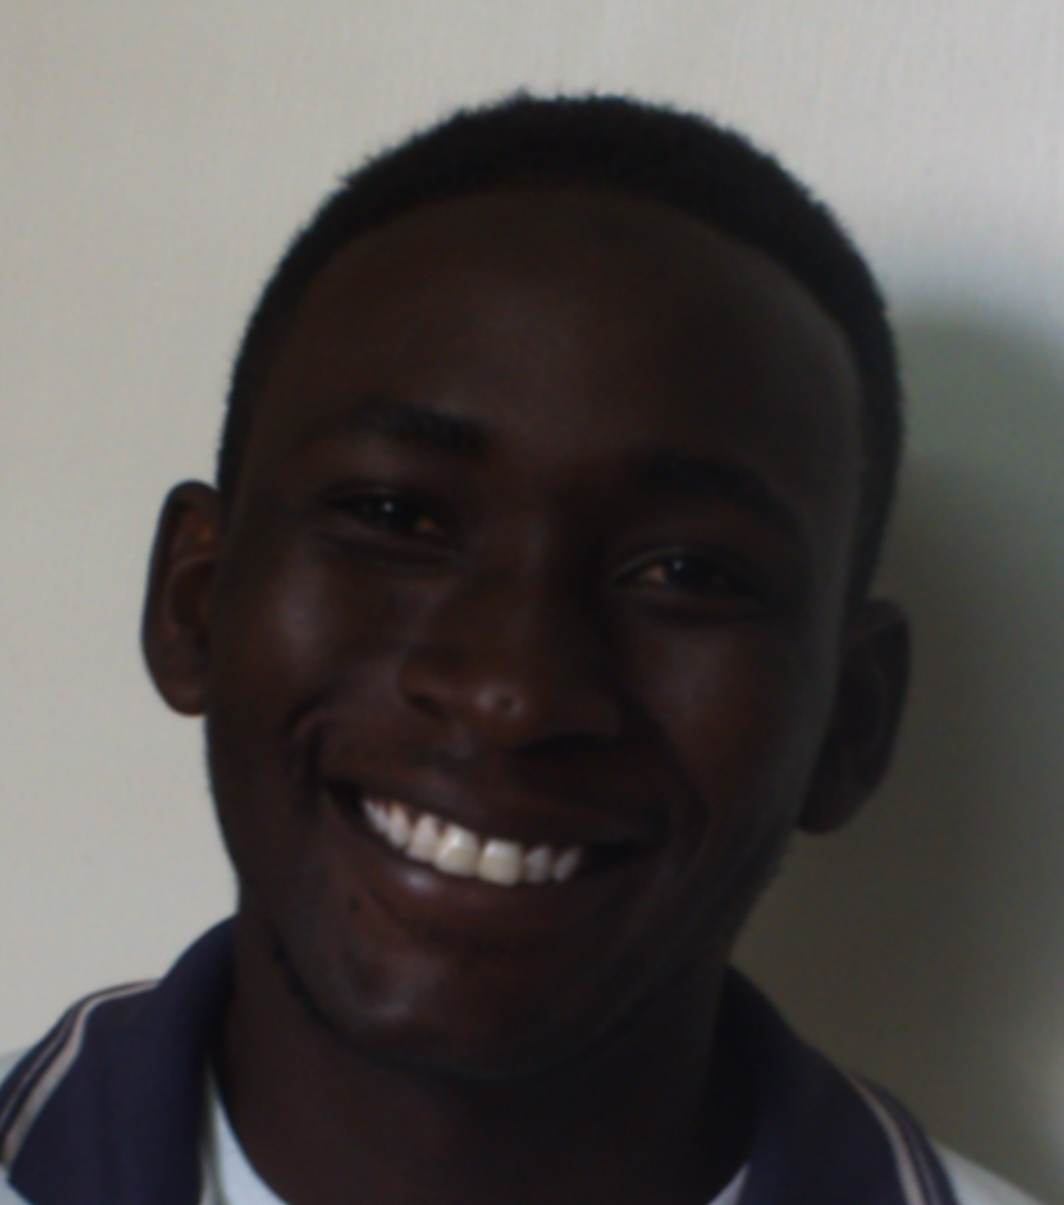 Hussein Abdhallah